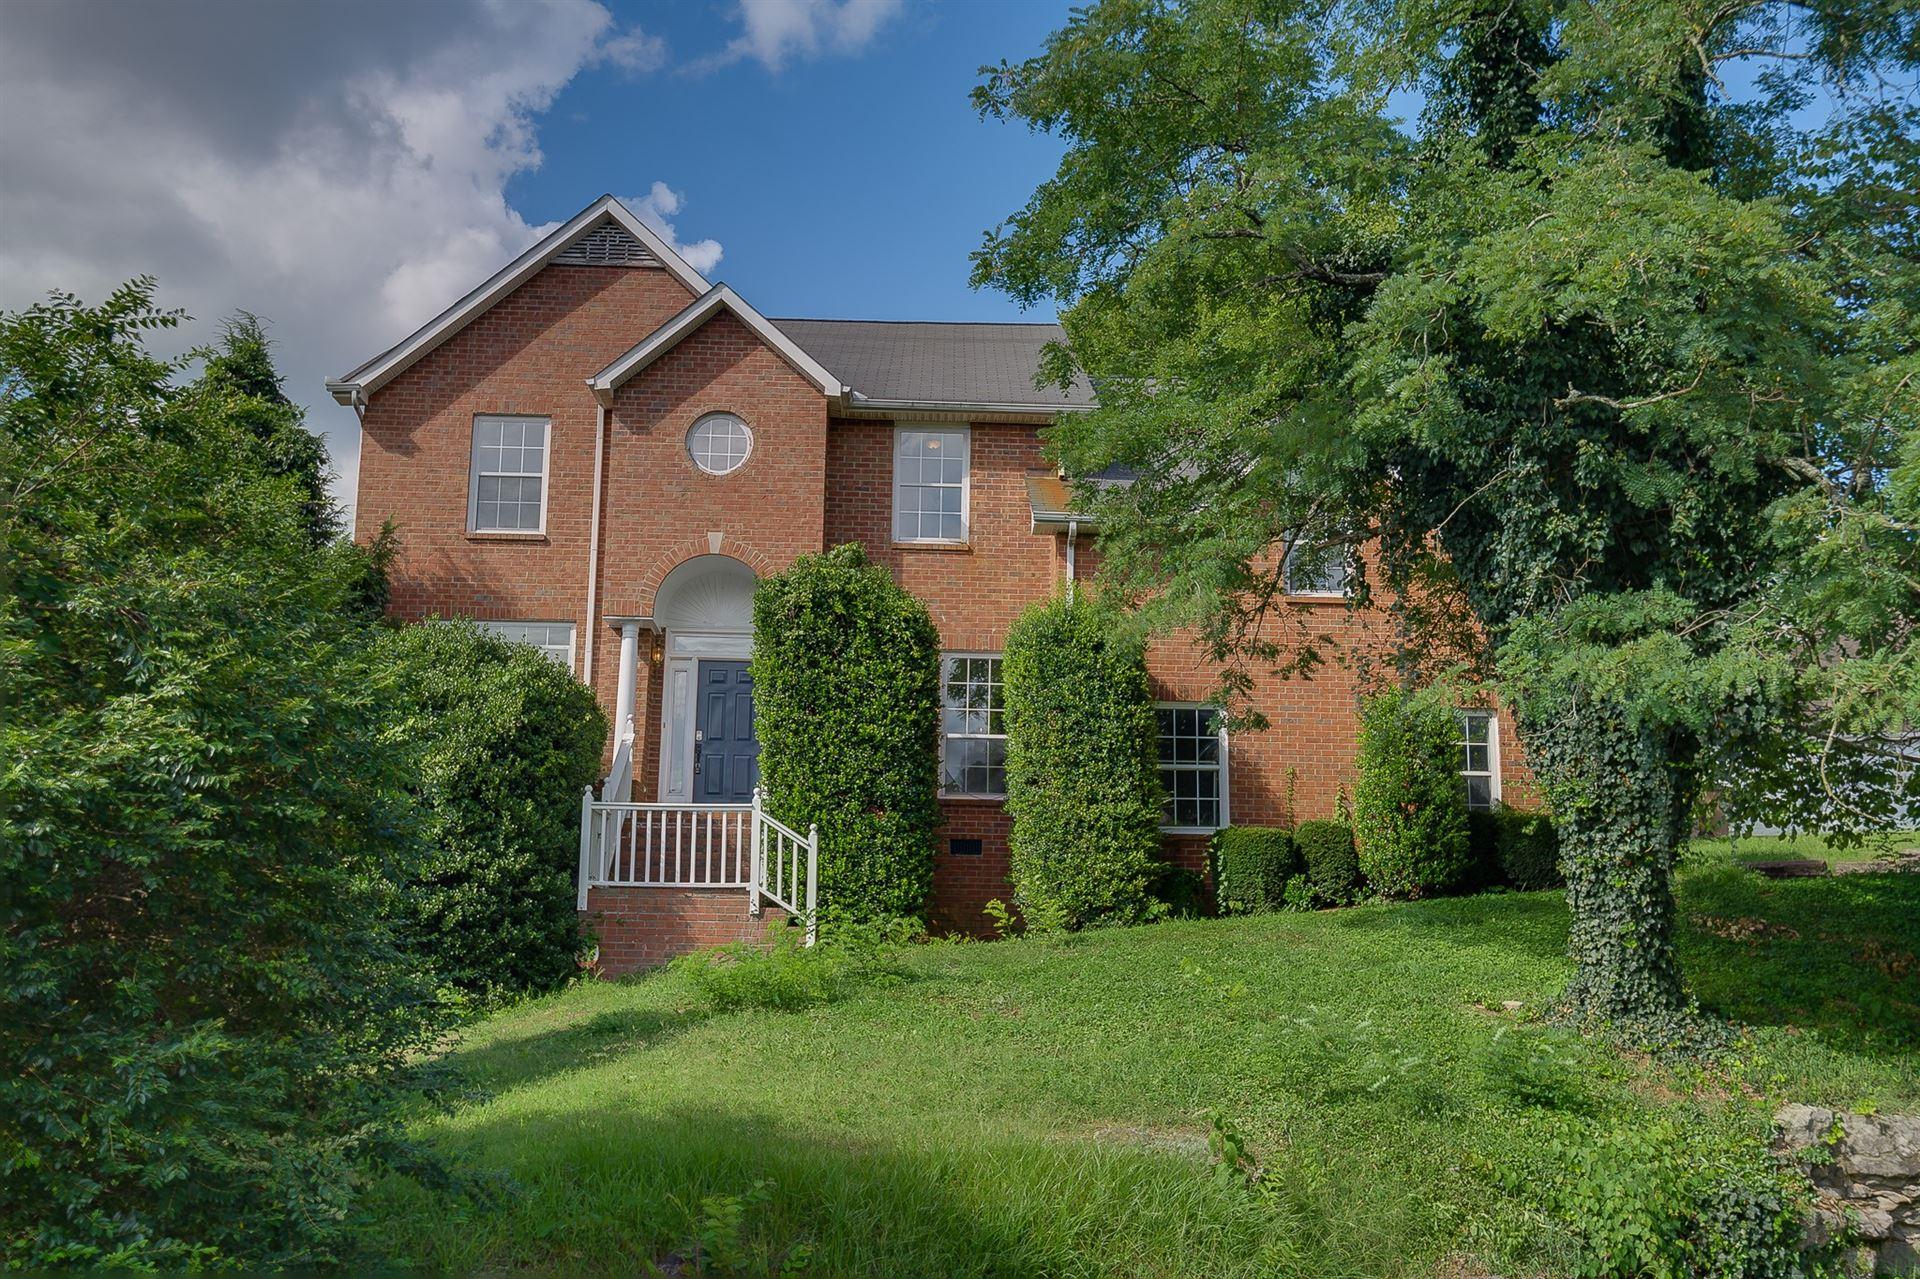 1401 Cedarway Ln, Nashville, TN 37211 - MLS#: 2286626